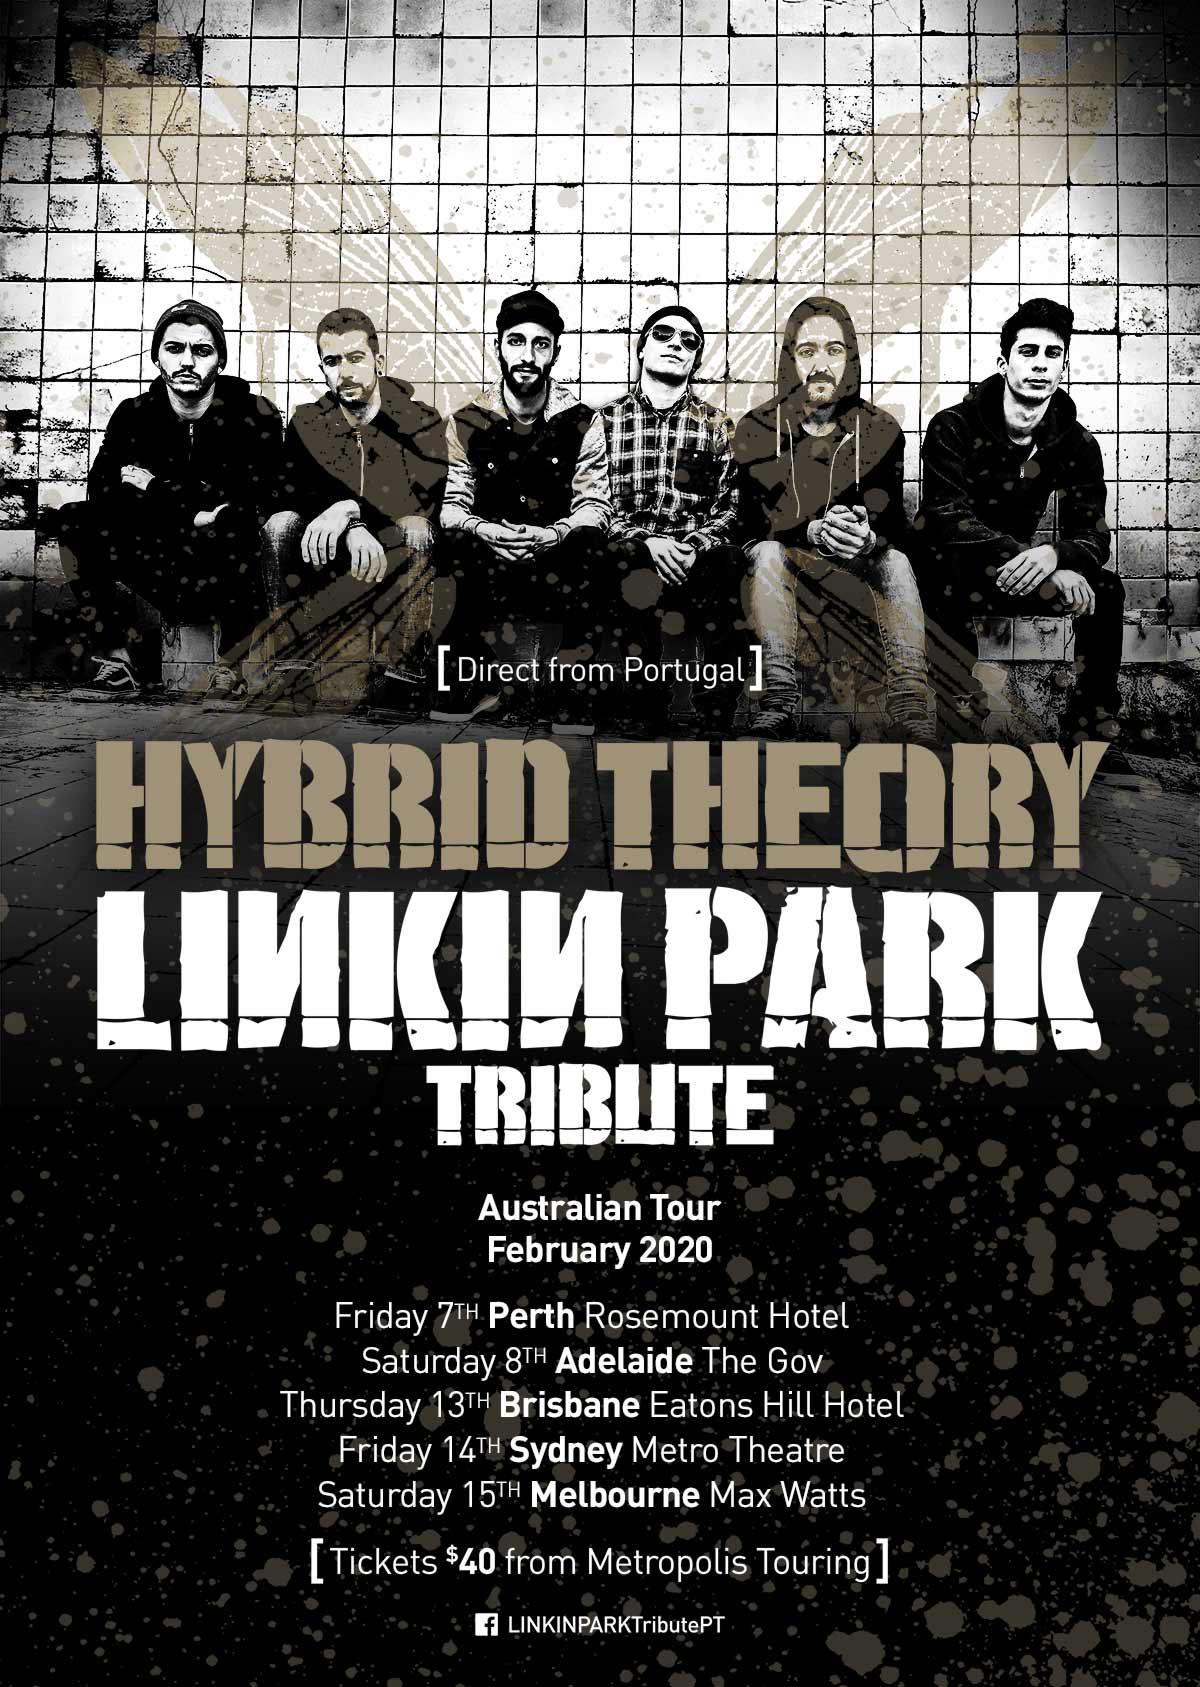 Linkin Park Us Tour 2020 Hybrid Theory (Linkin Park Tribute)